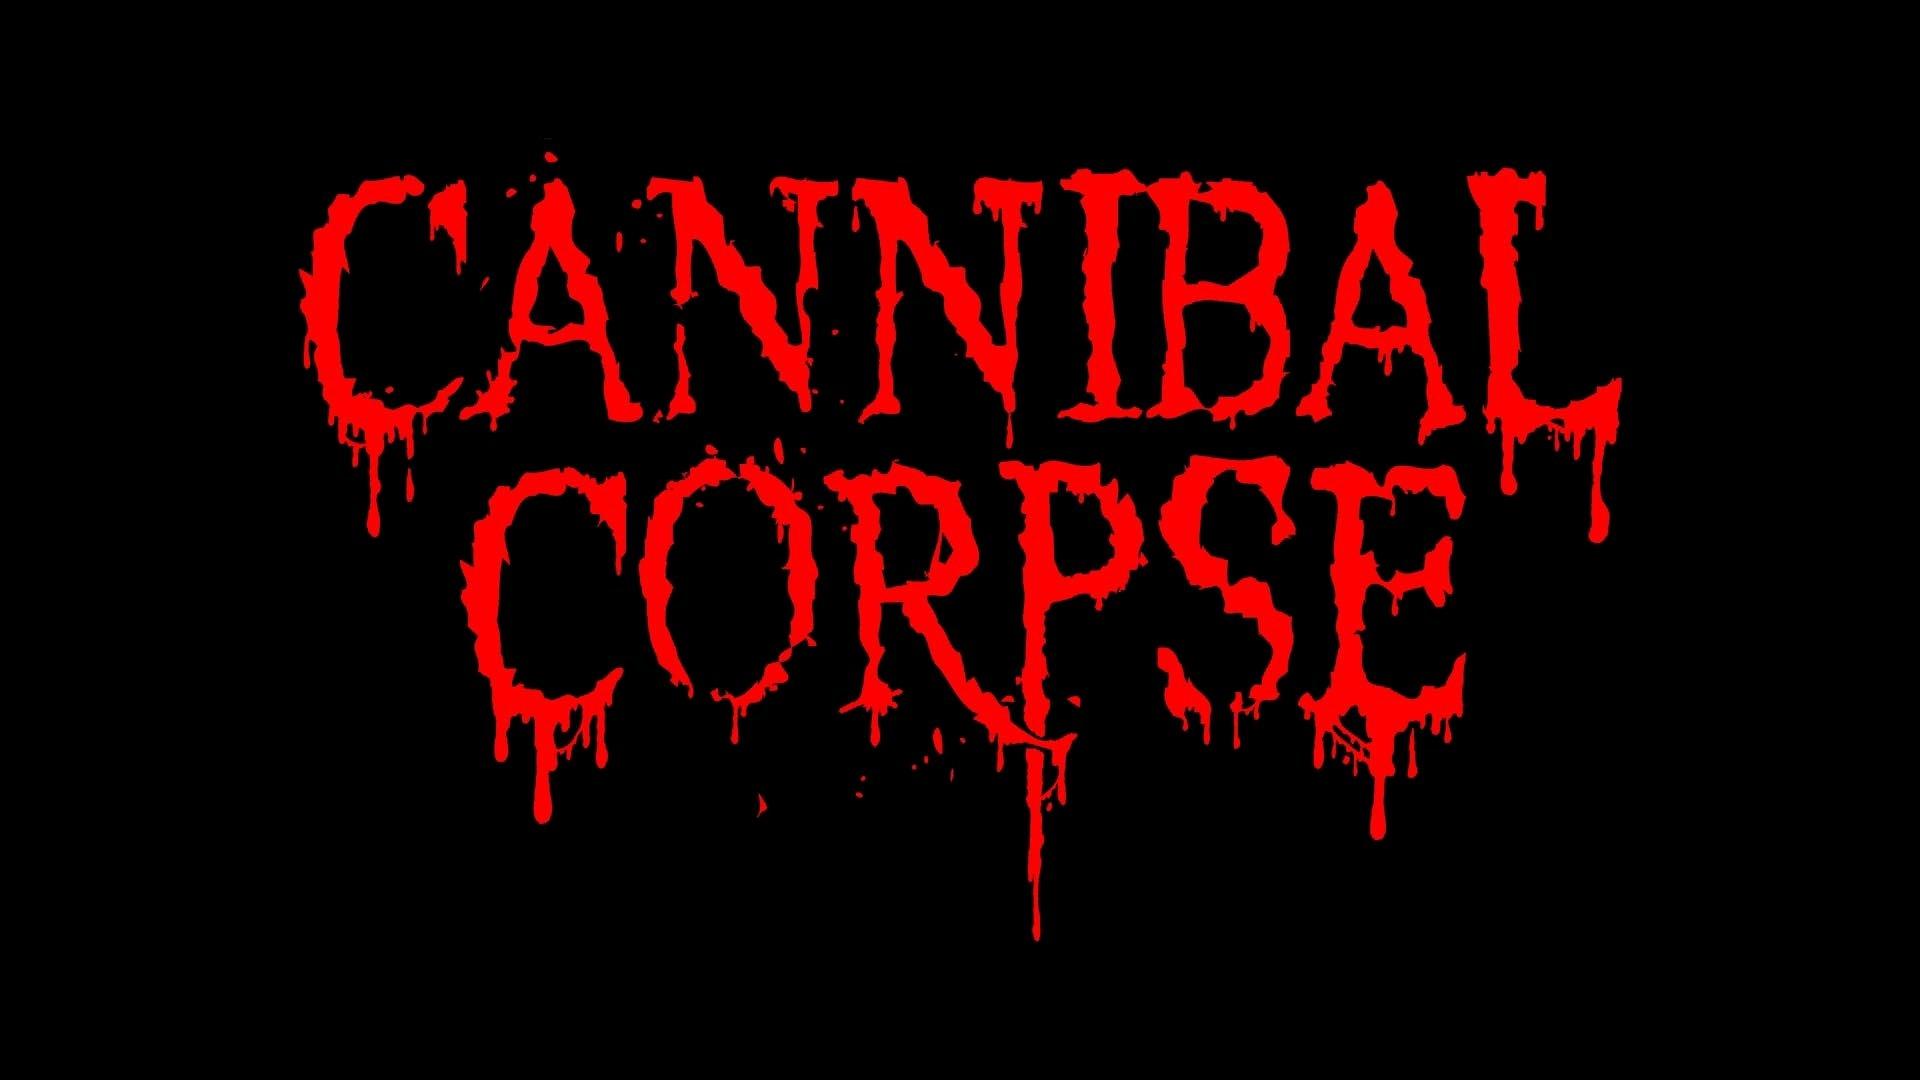 Best 40 Cannibal Corpse Desktop Backgrounds on HipWallpaper 1920x1080